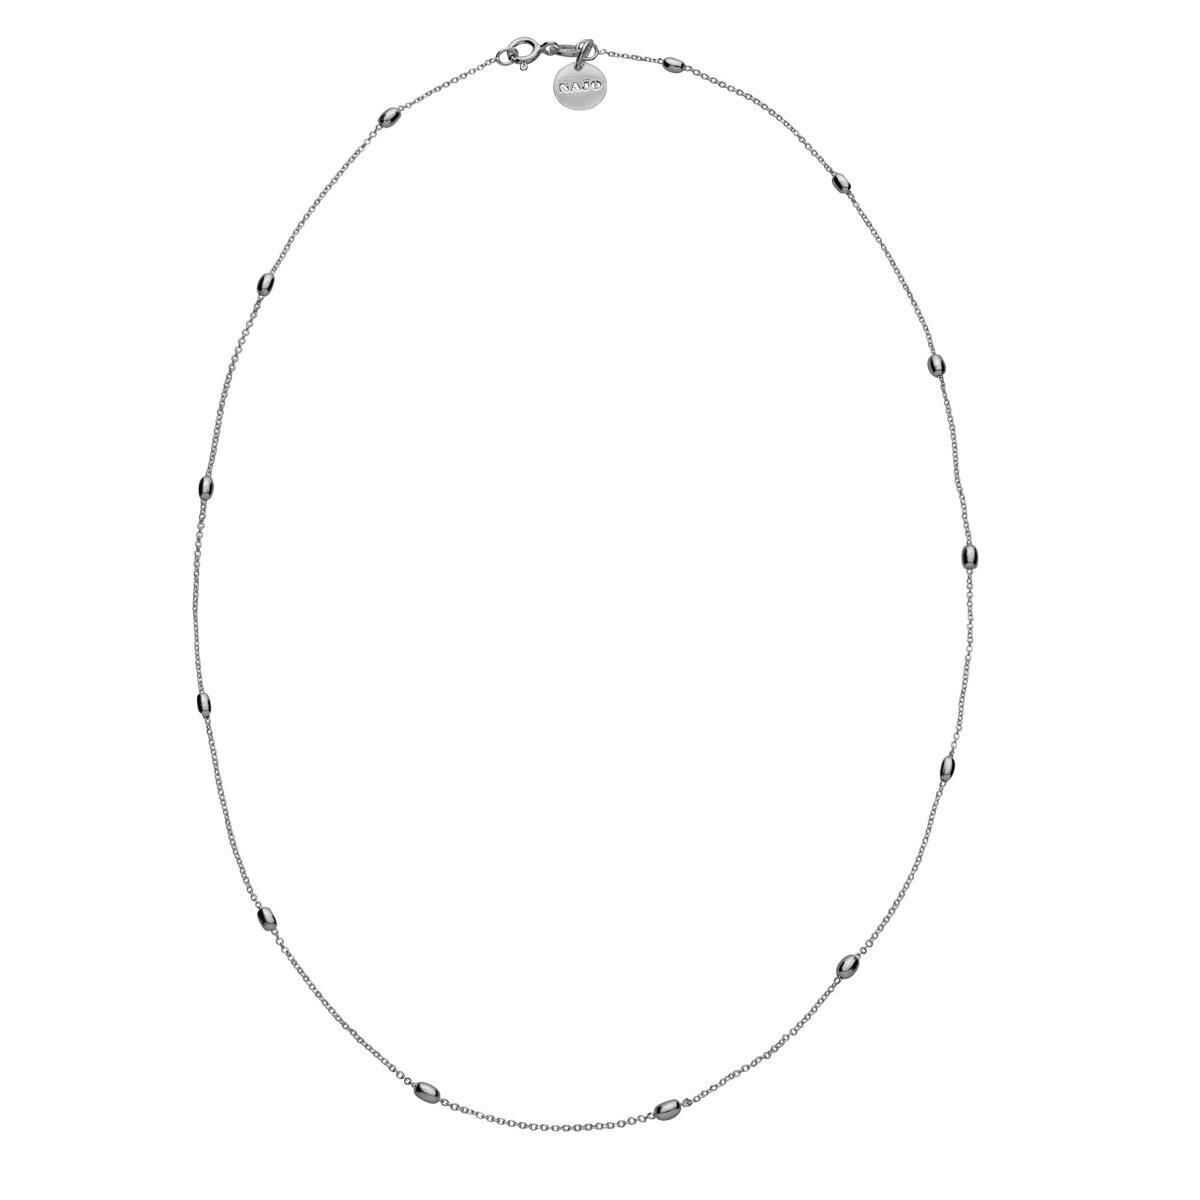 Najo - Like a Breeze Necklace 45cm